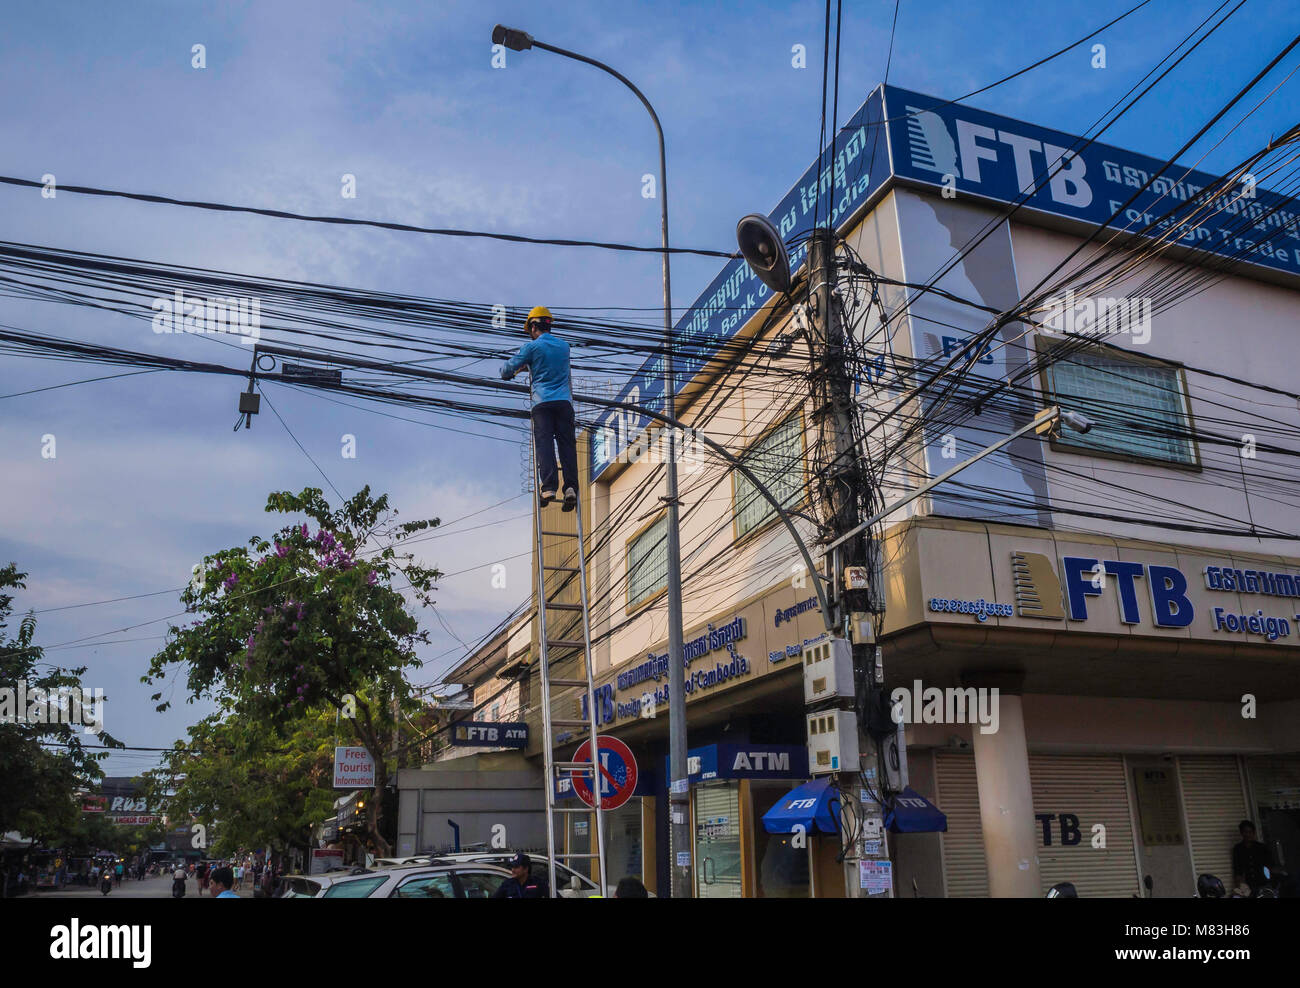 Power Lineman Electrician Stock Photos & Power Lineman Electrician ...